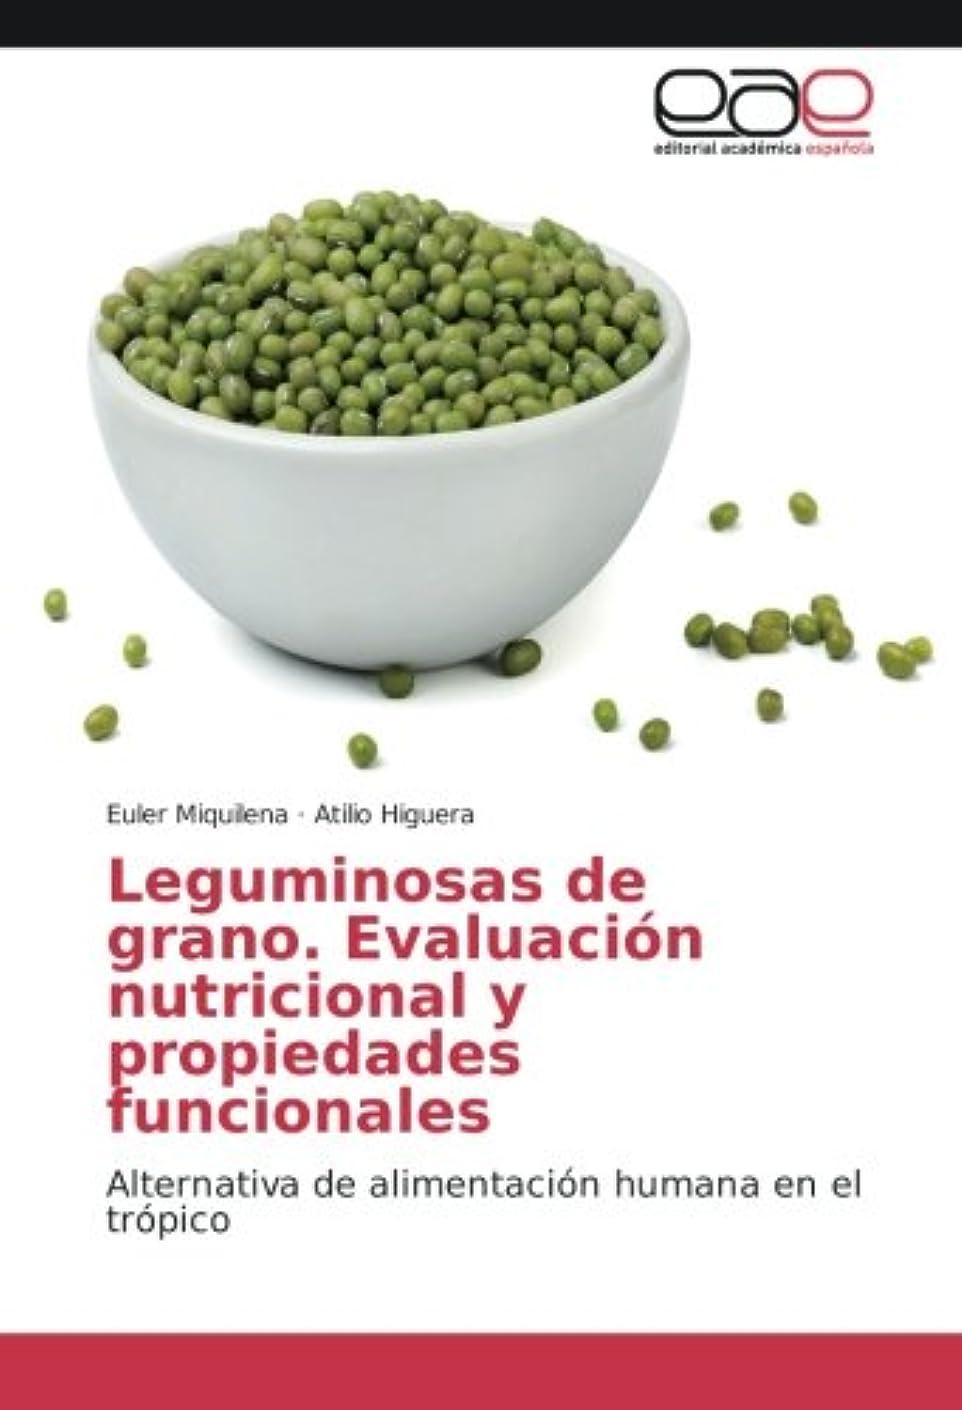 抑制眩惑する依存するLeguminosas de grano. Evaluación nutricional y propiedades funcionales: Alternativa de alimentación humana en el trópico